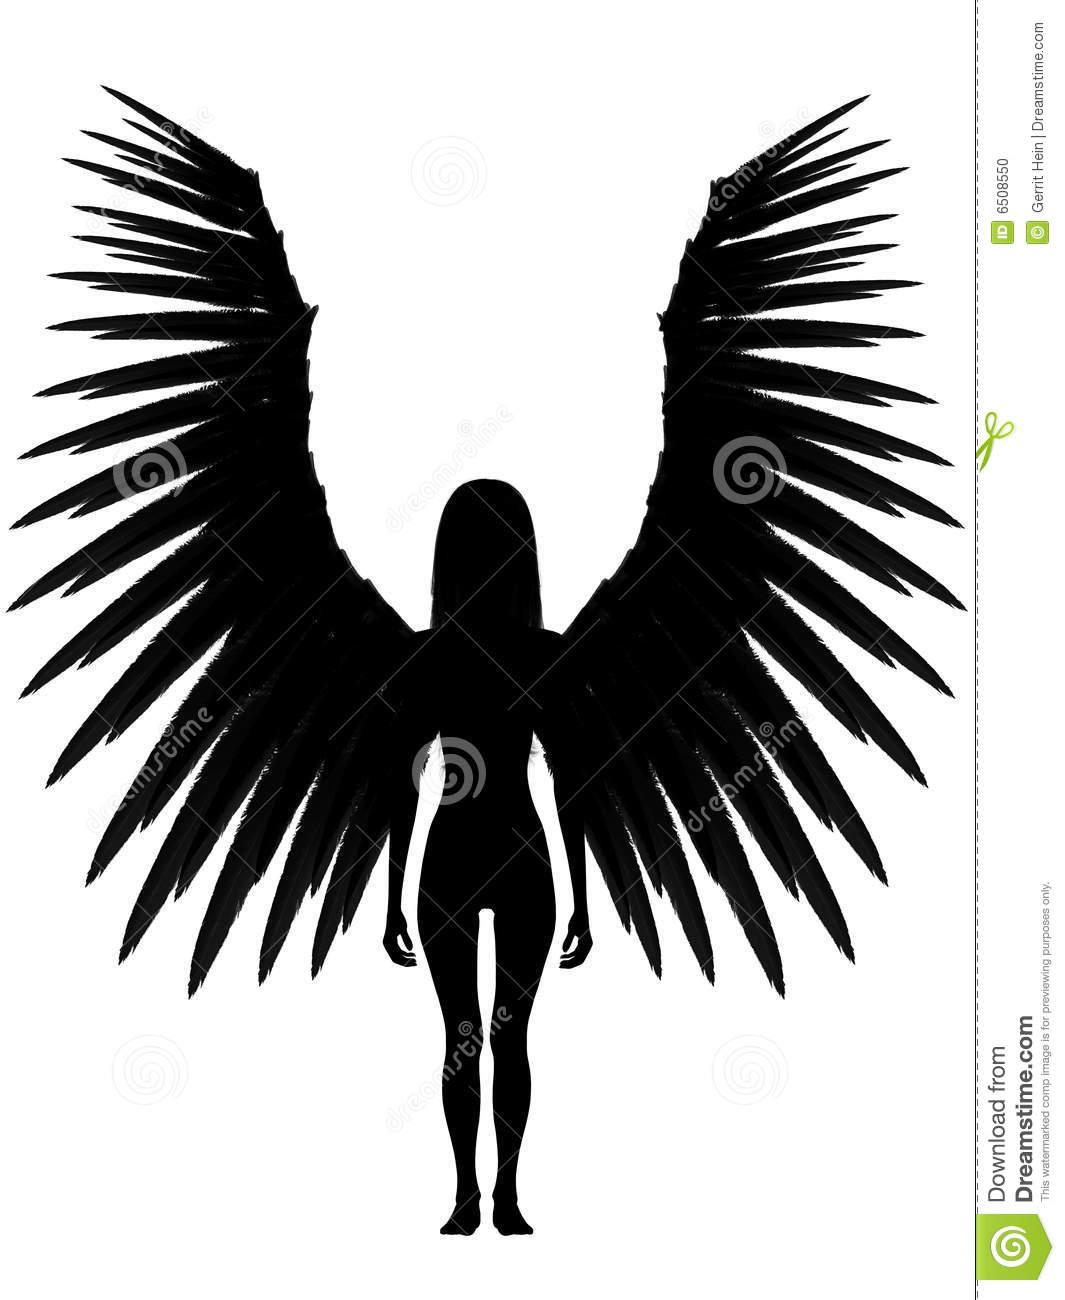 Dark Angel clipart #6, Download drawings